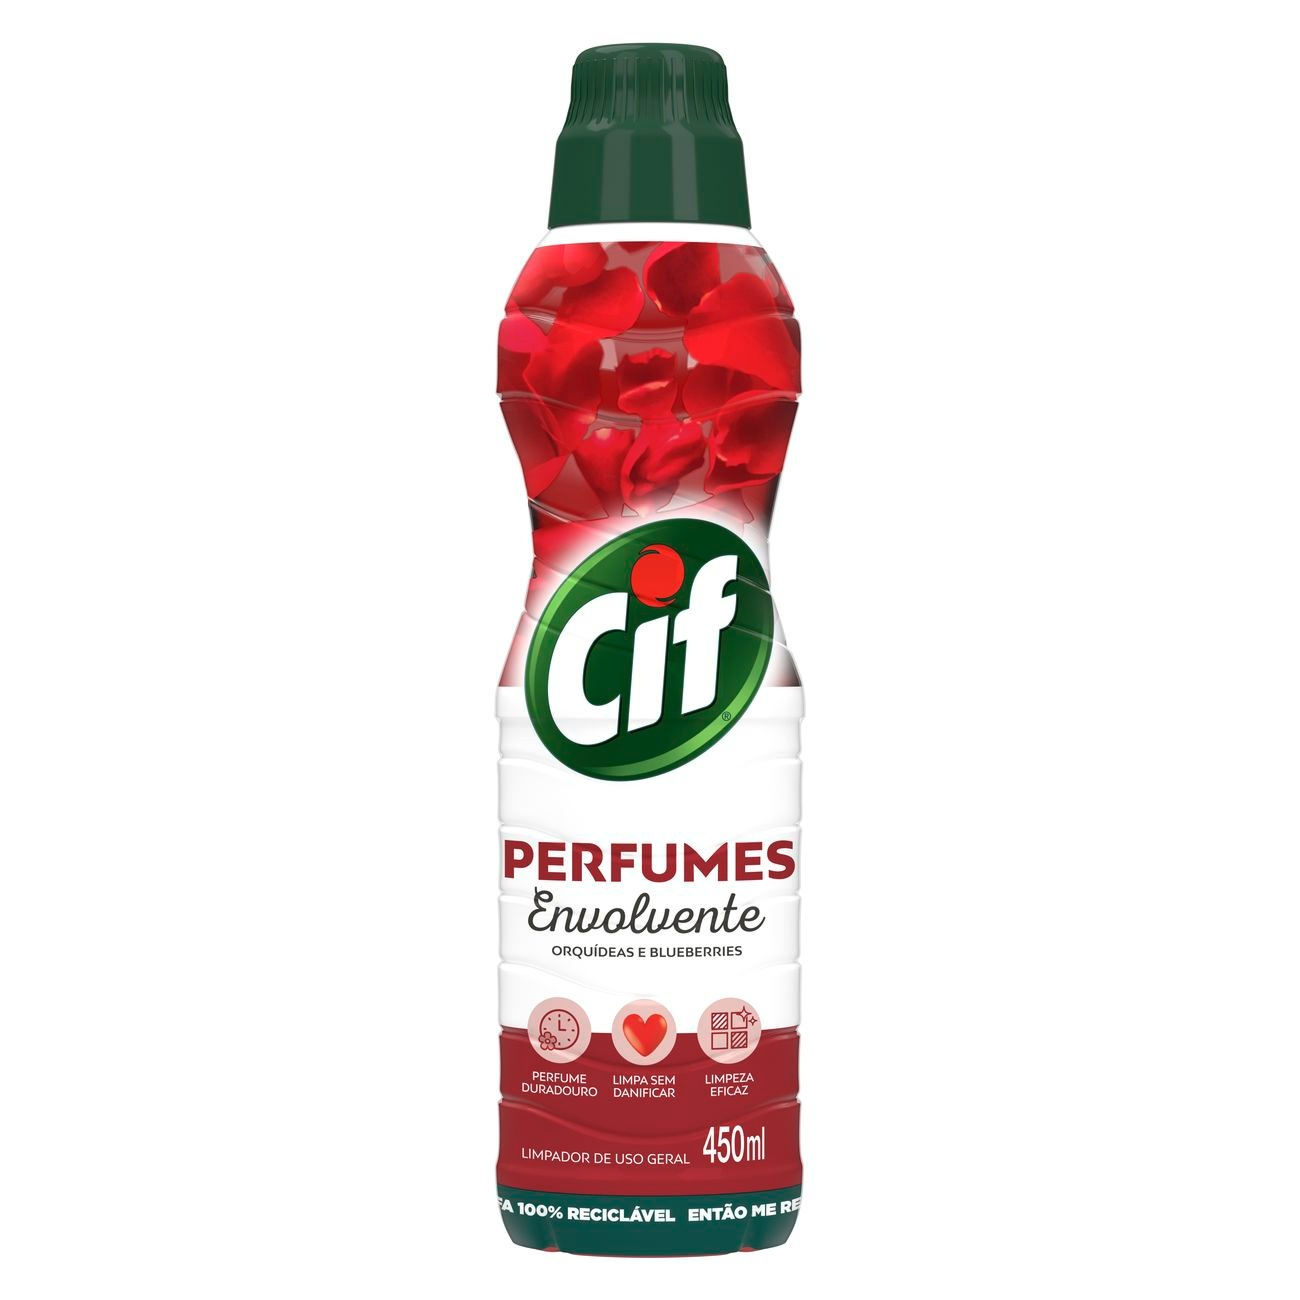 Limpa Pisos Cif Perfumes Envolvente 450mL